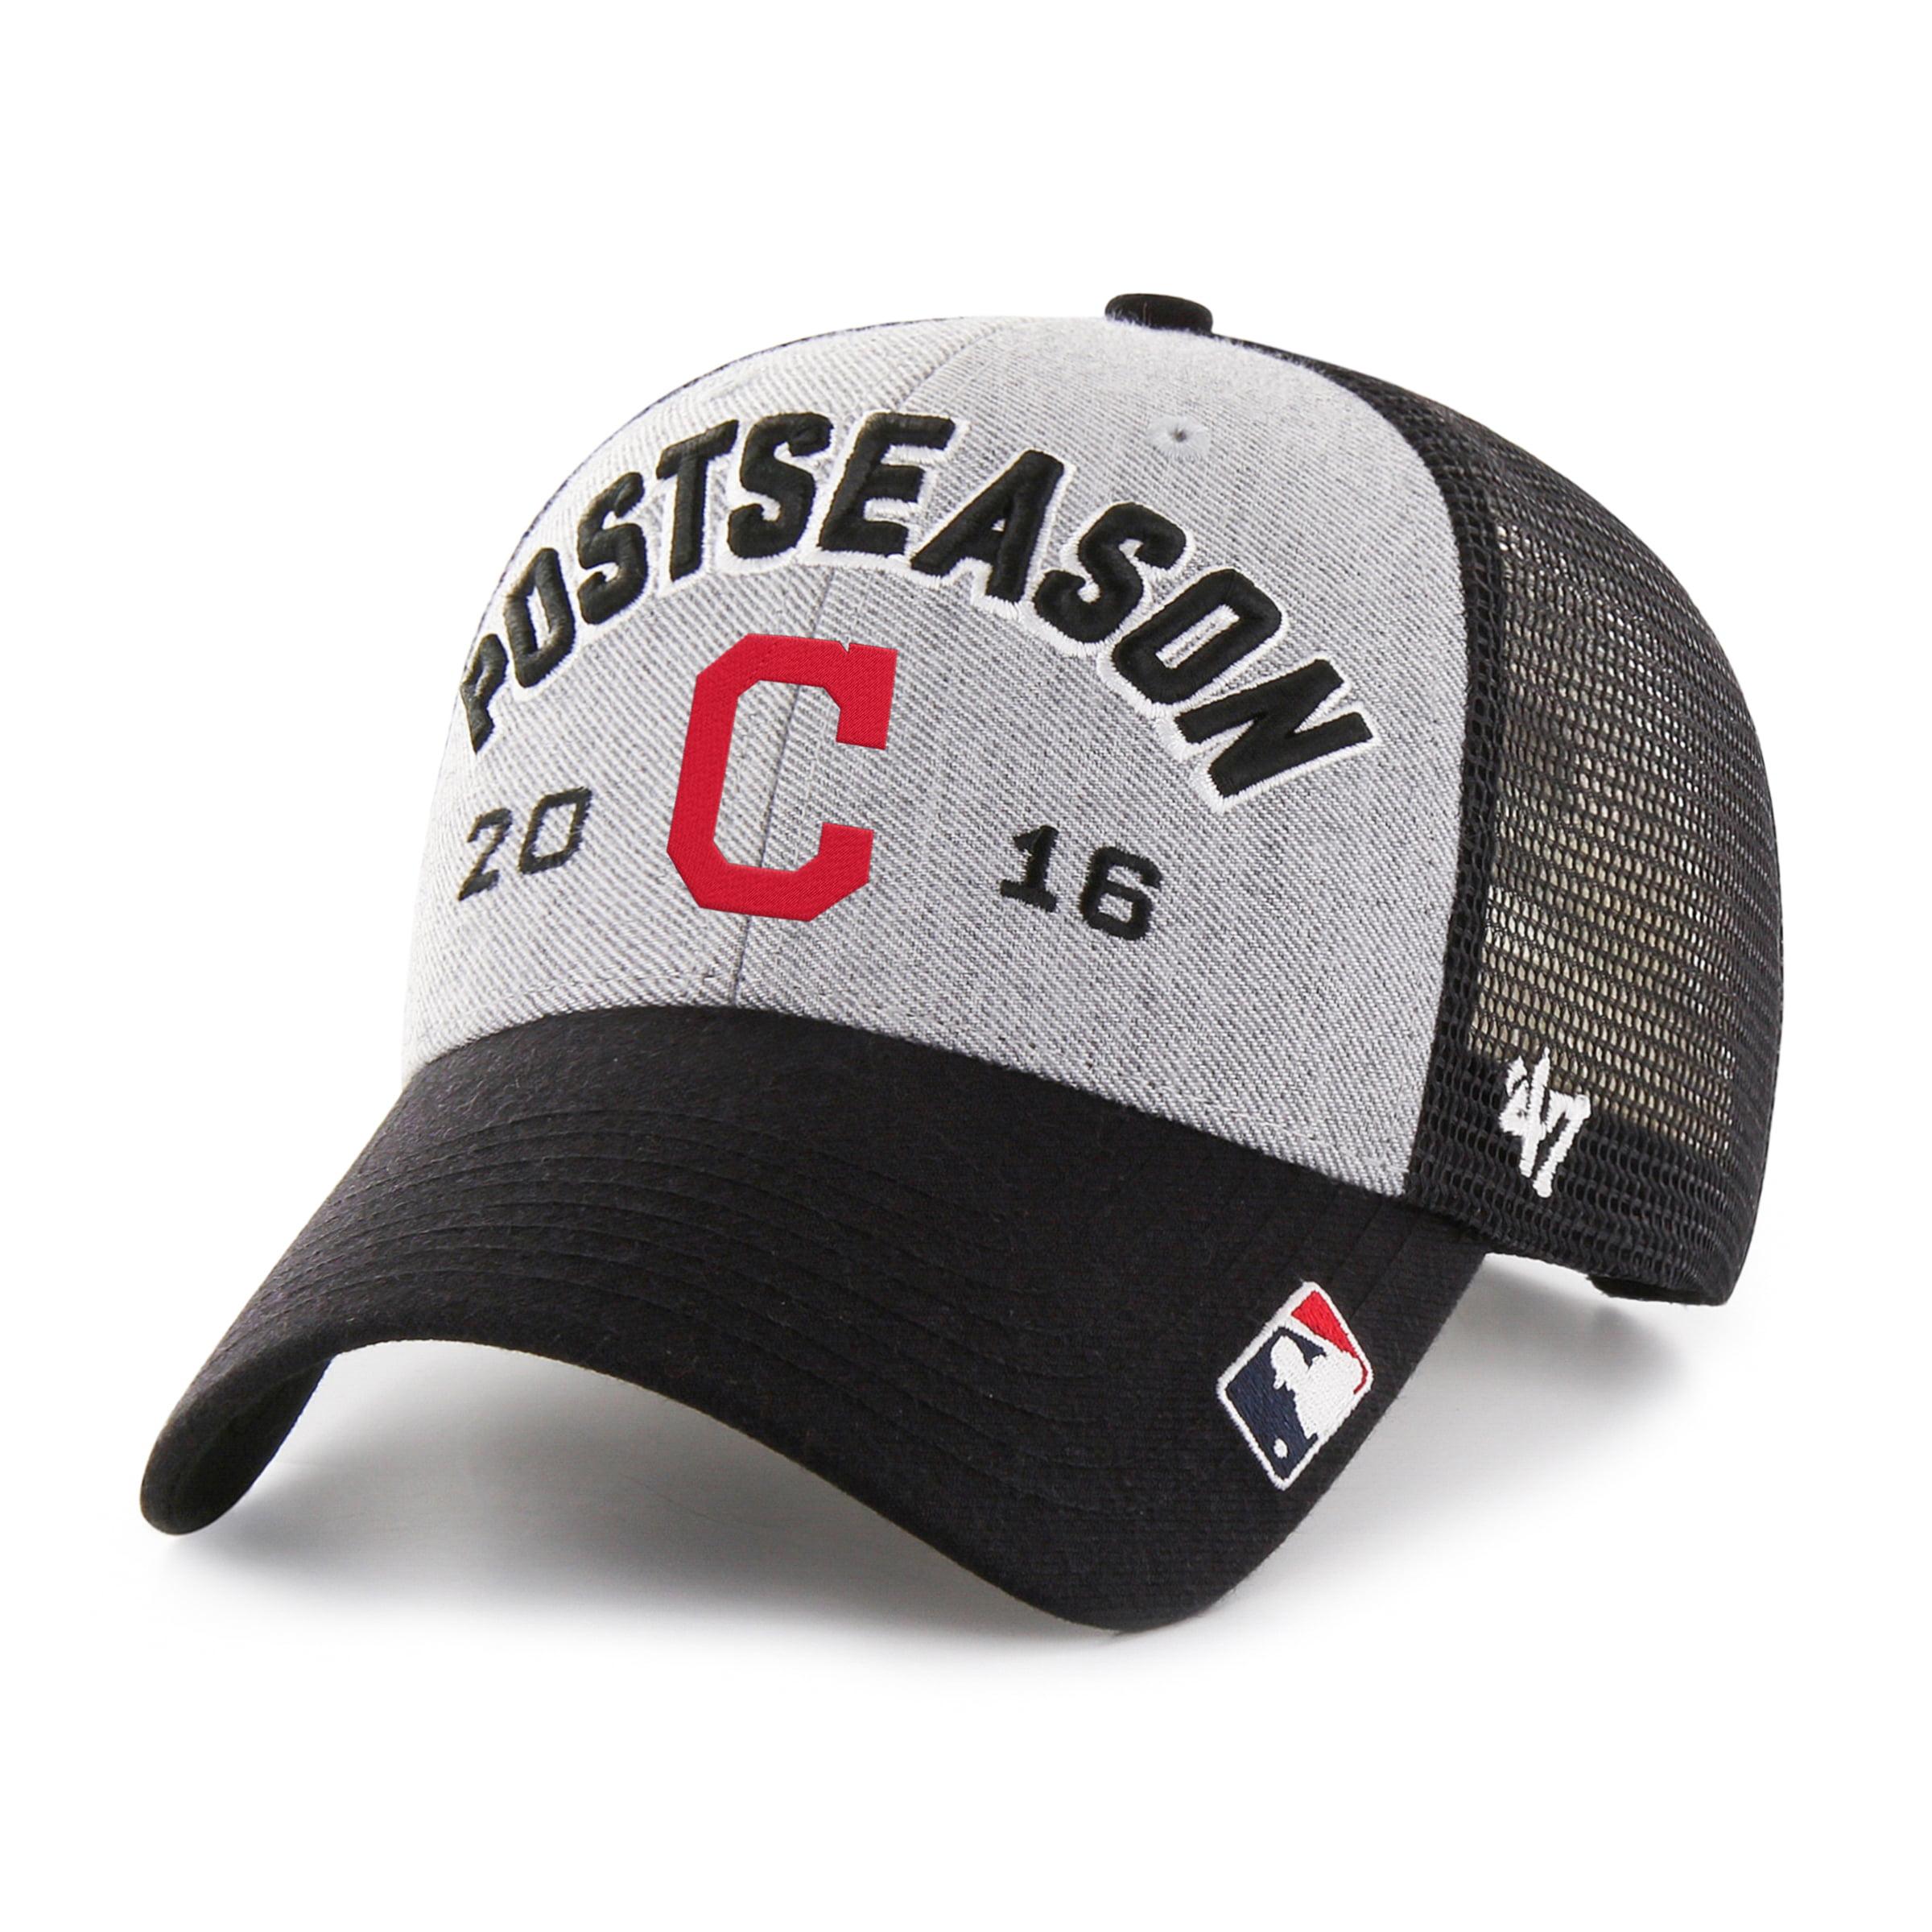 Cleveland Indians '47 2016 AL Central Division Champions Locker Room Adjustable Hat - Gray/Black - OSFA